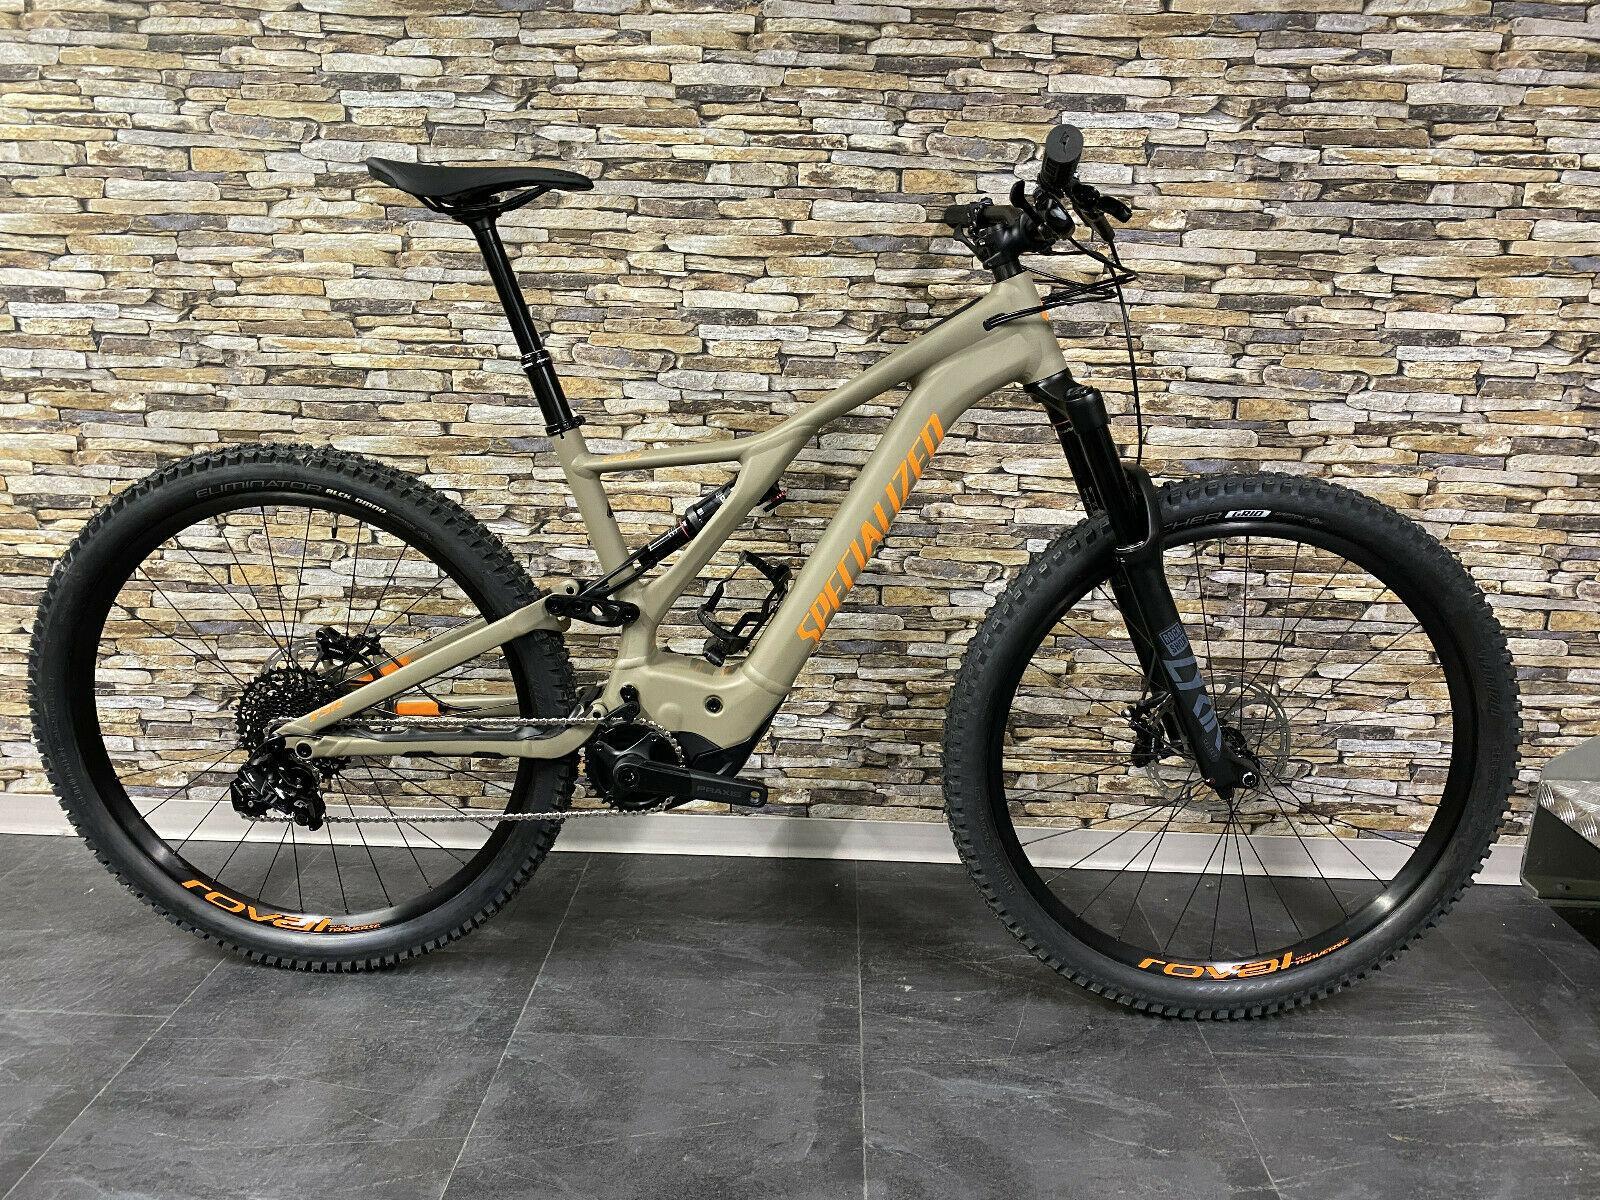 BikeReview-Husqvarna-701-Enduro-LR-7 - Bike Review